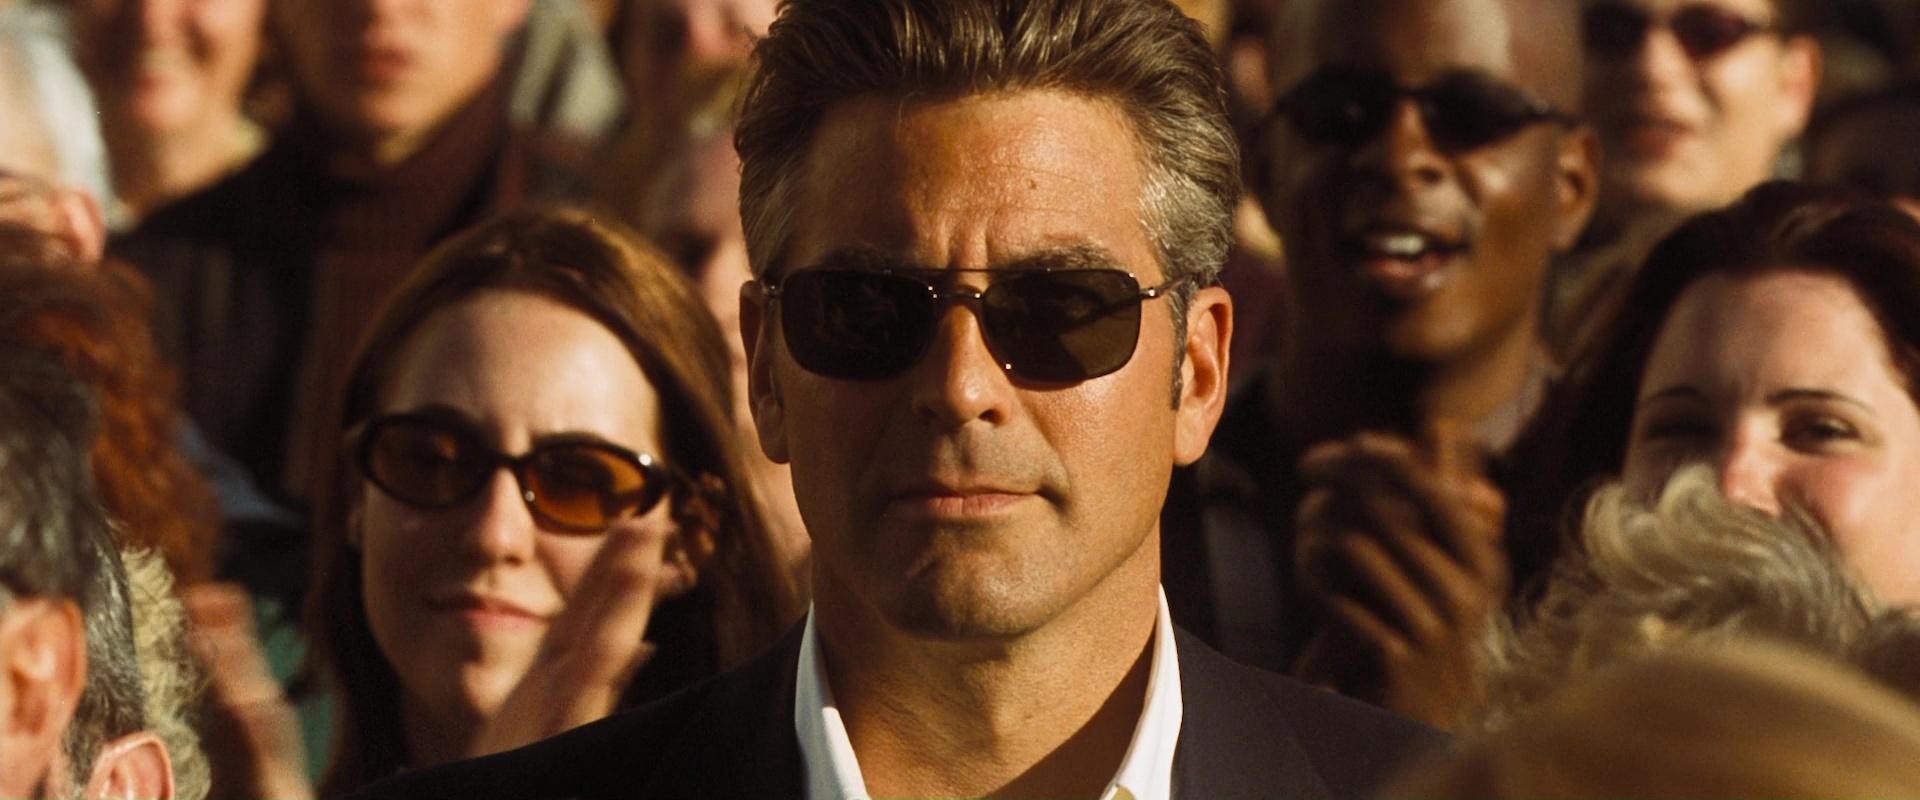 Persol-Sunglasses-Worn-by-George-Clooney-in-Oceans-Eleven-1.jpg